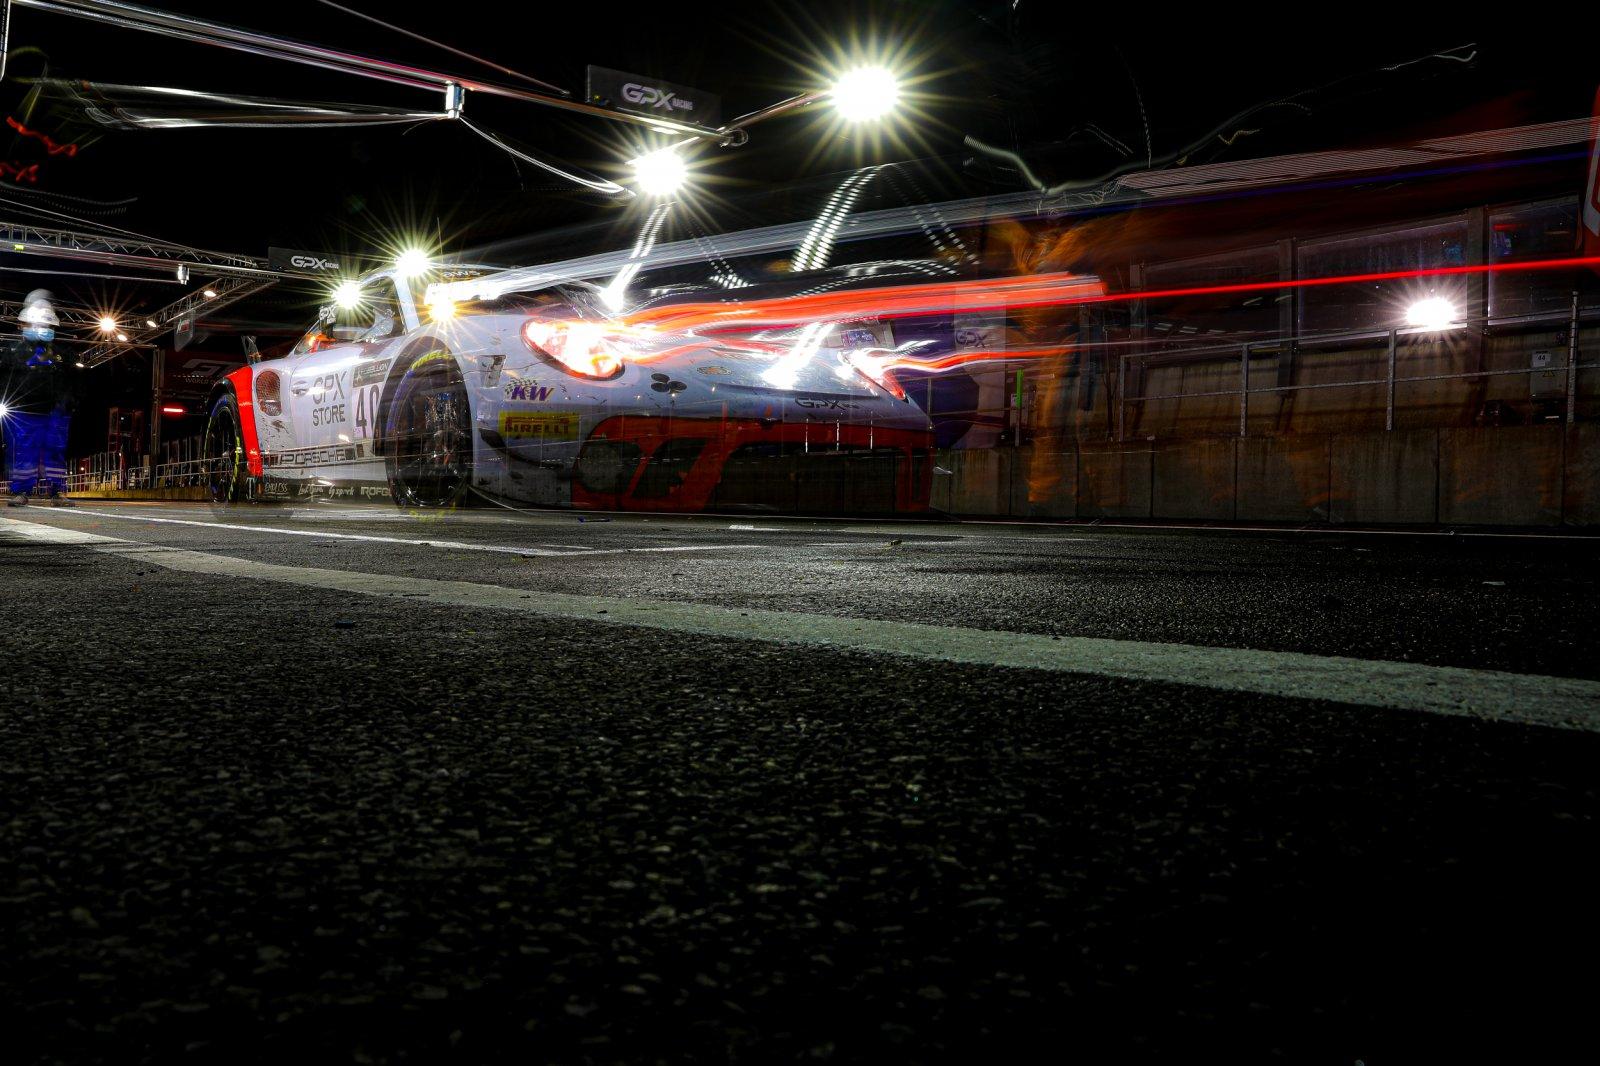 #40 GPX Racing UAE- Romain Dumas FRA Louis Deletraz CHE Thomas Preining AUT, Pitlane, Race